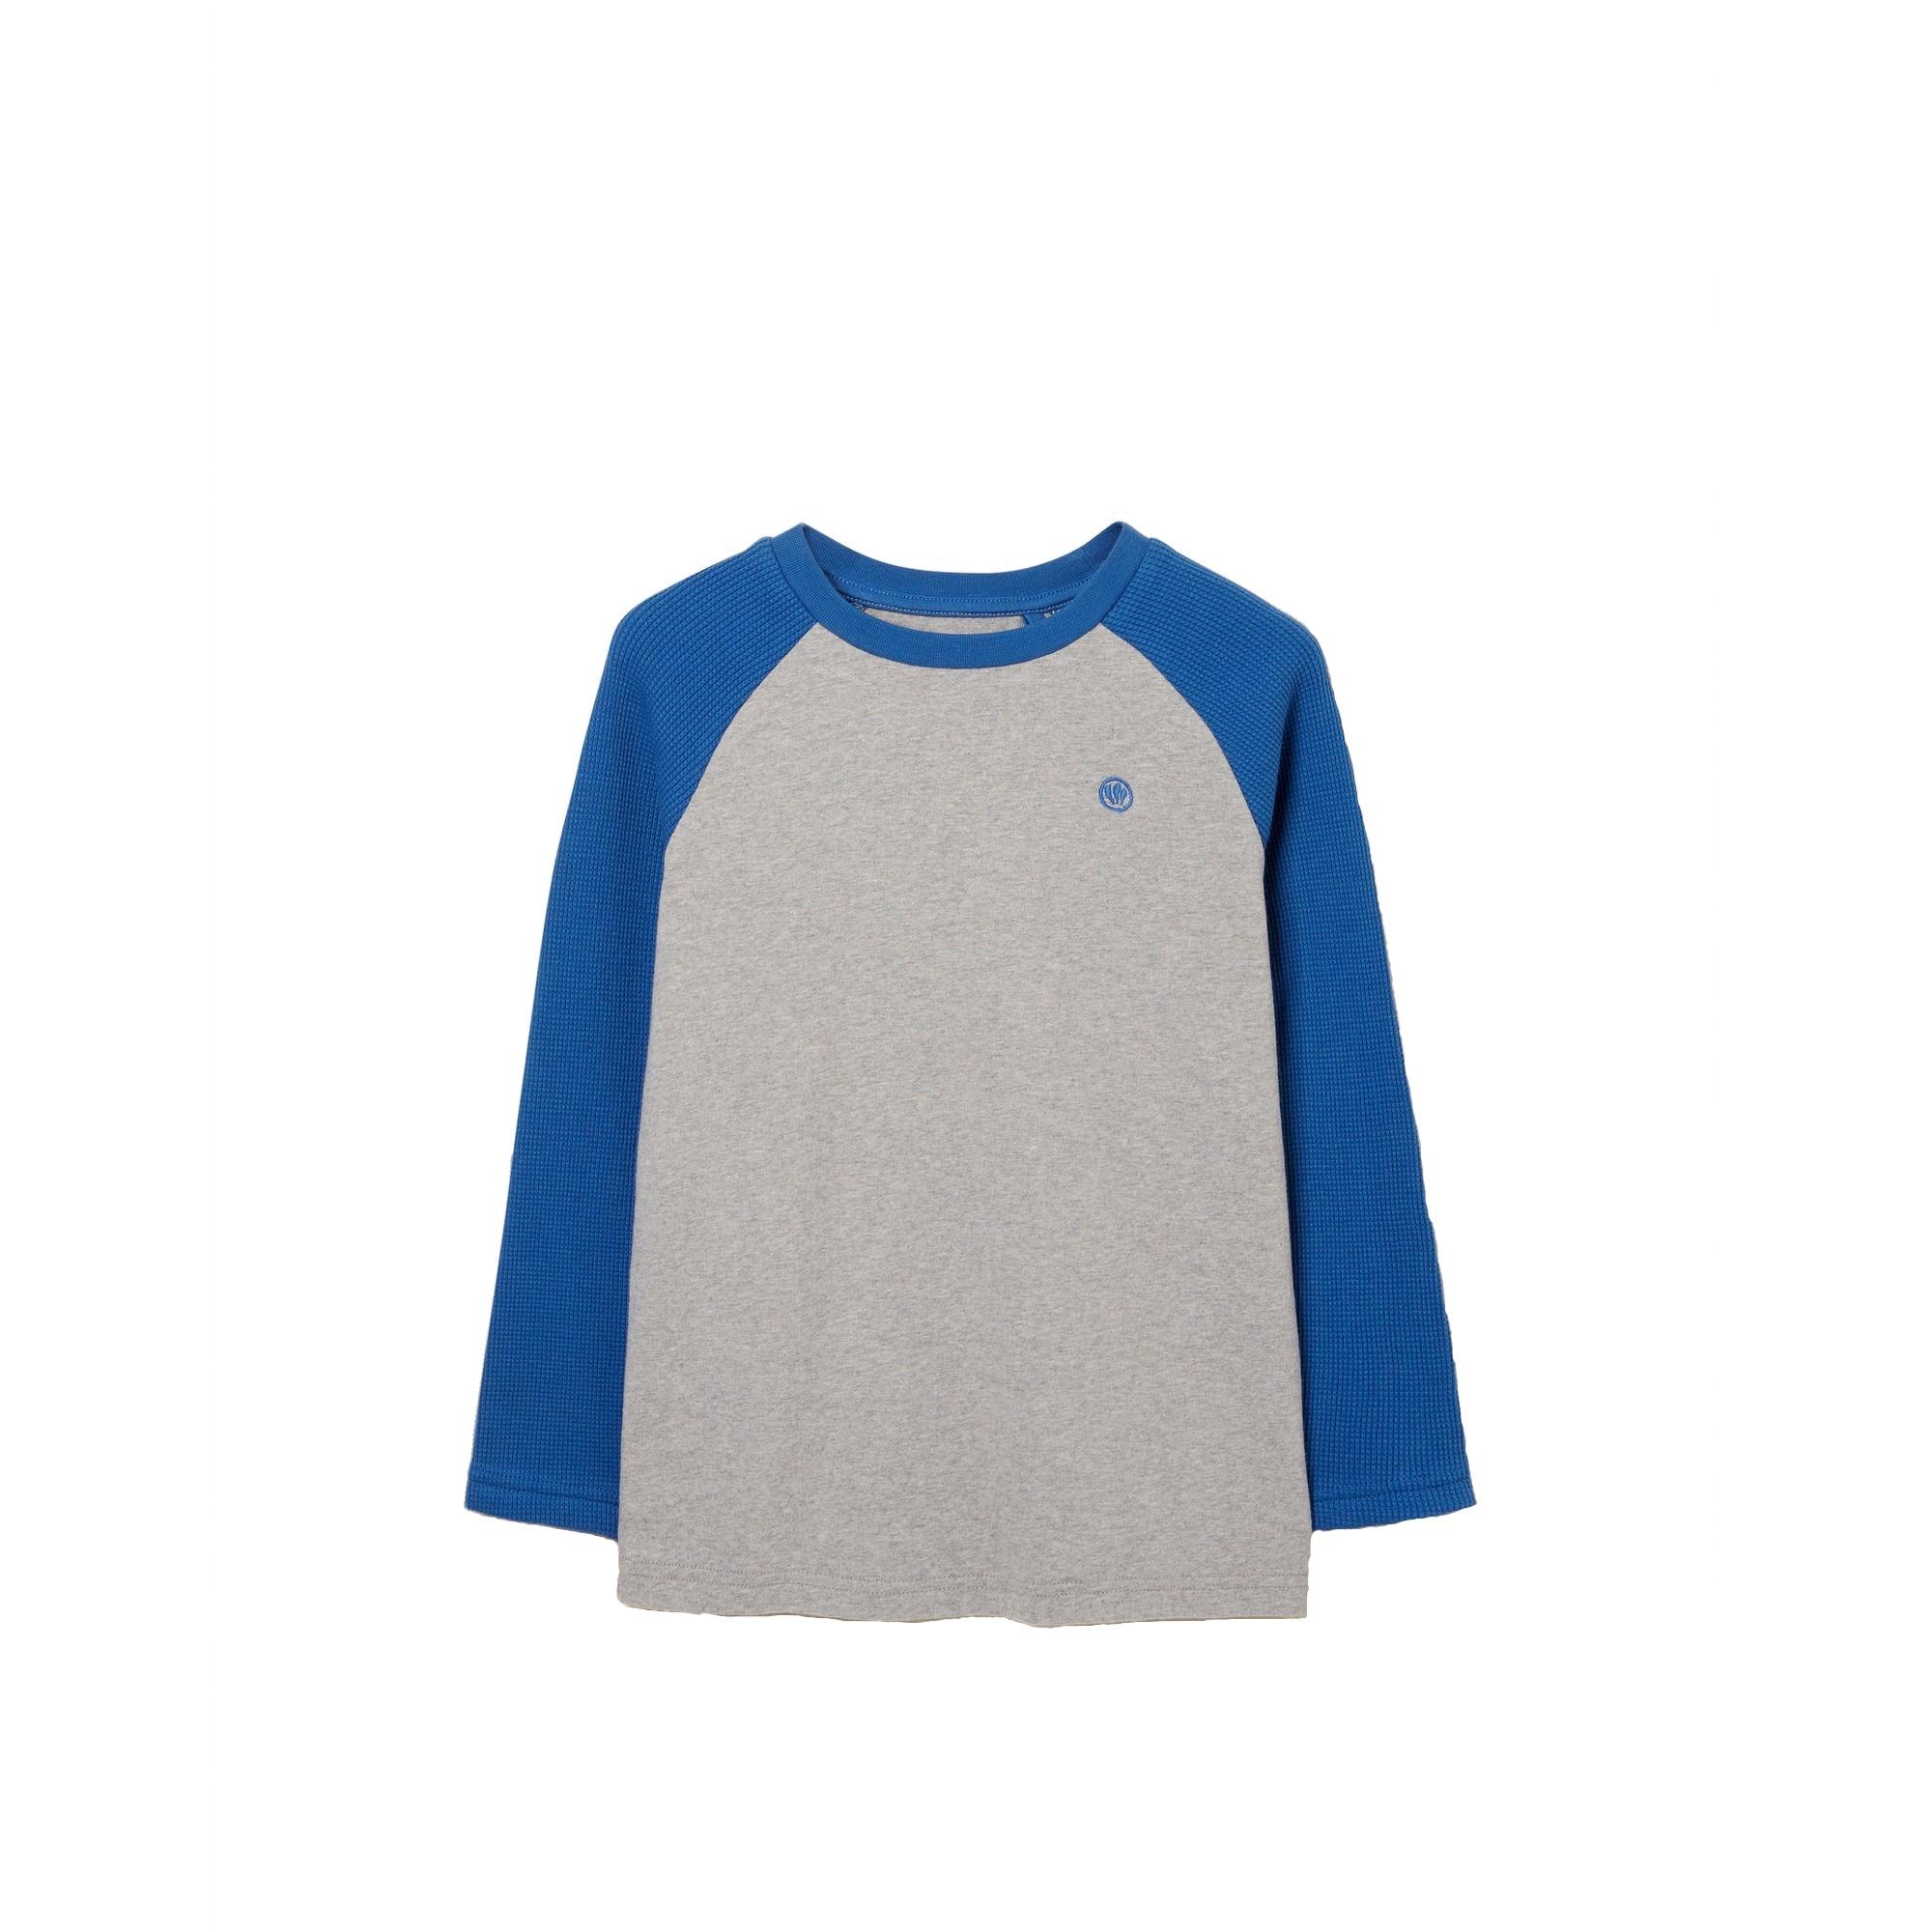 Image of FatFace Langarmshirt »Kinder mit kontrastierenden Raglanärmeln«